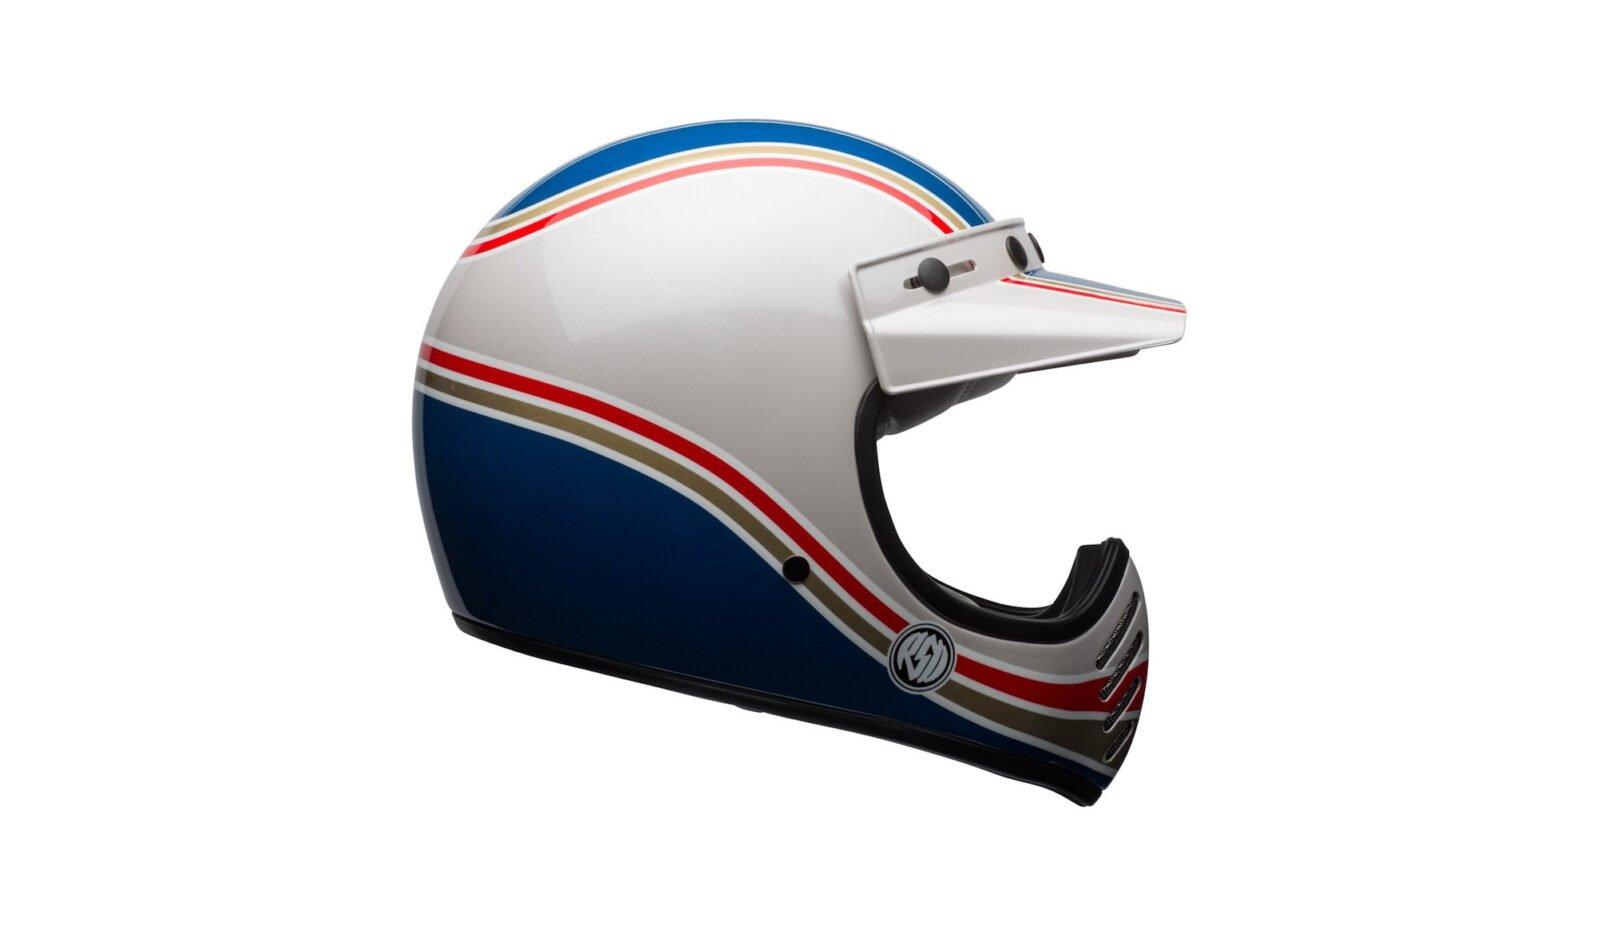 Bell Moto 3 RSD Malibu Helmet 1600x929 - Bell Moto-3 RSD Malibu Helmet